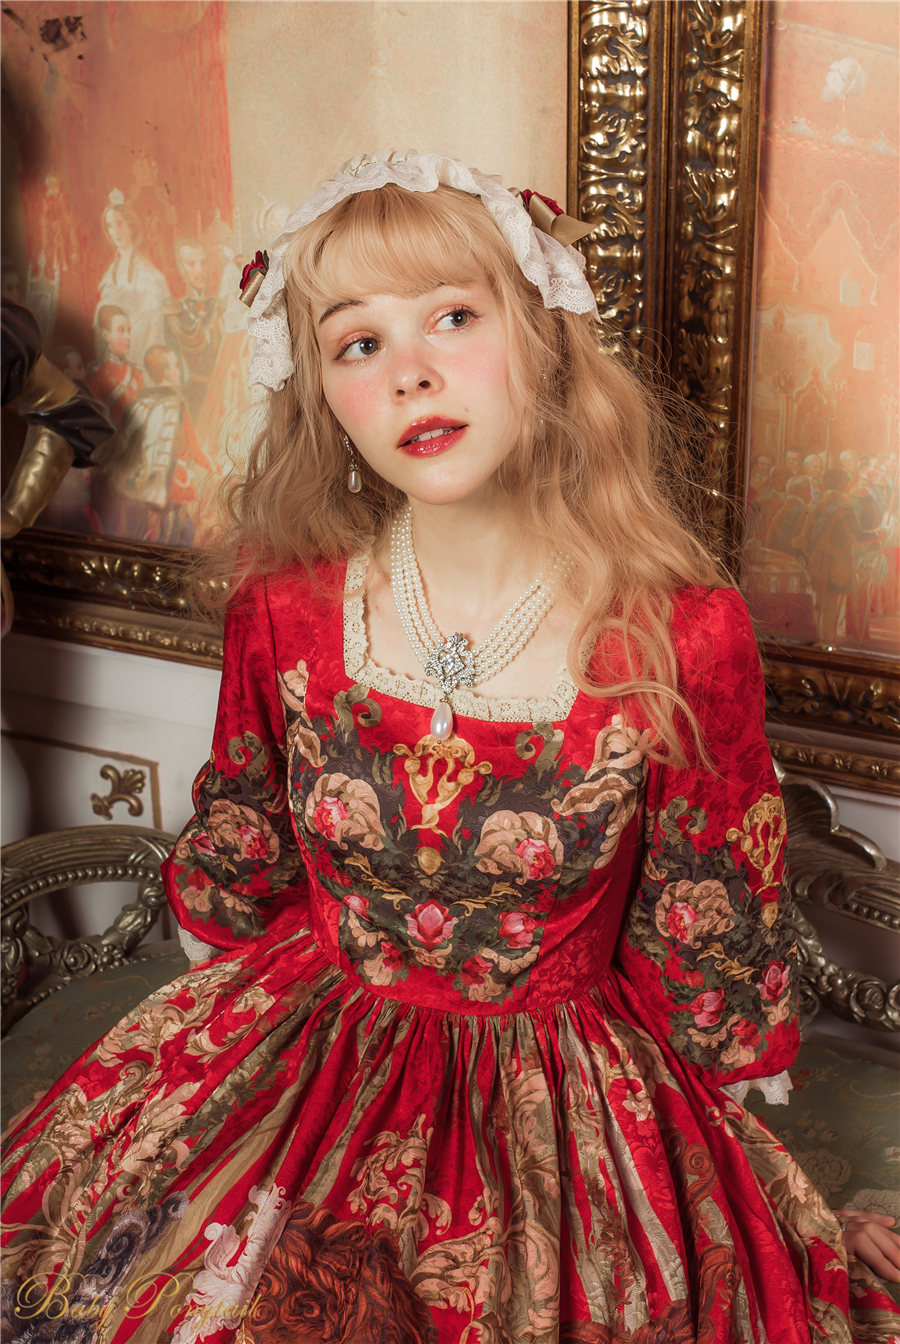 BabyPonytail_Rose Battle_Model Photo_OP Red studio_Claudia_02.jpg